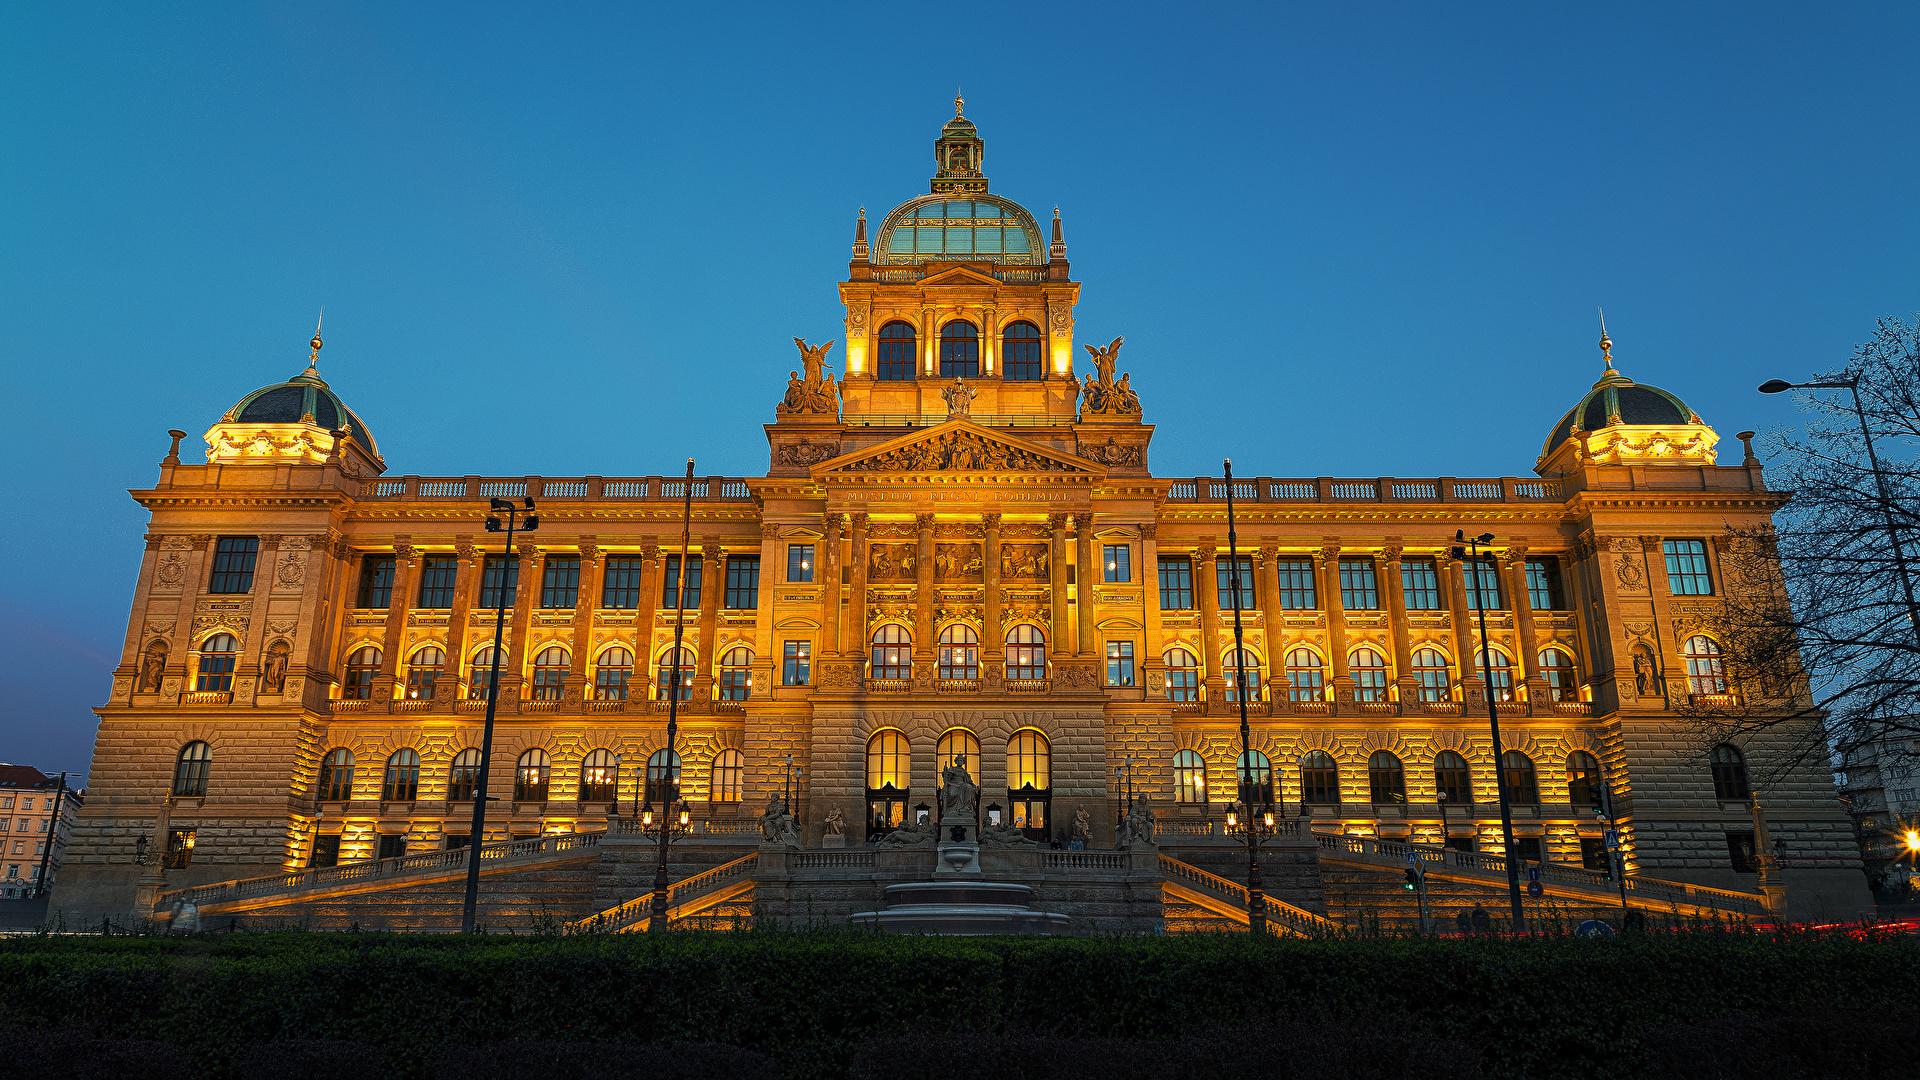 Фотография Прага Чехия музеи National Museum Лестница Вечер Уличные фонари Дома Города 1920x1080 Музей лестницы город Здания